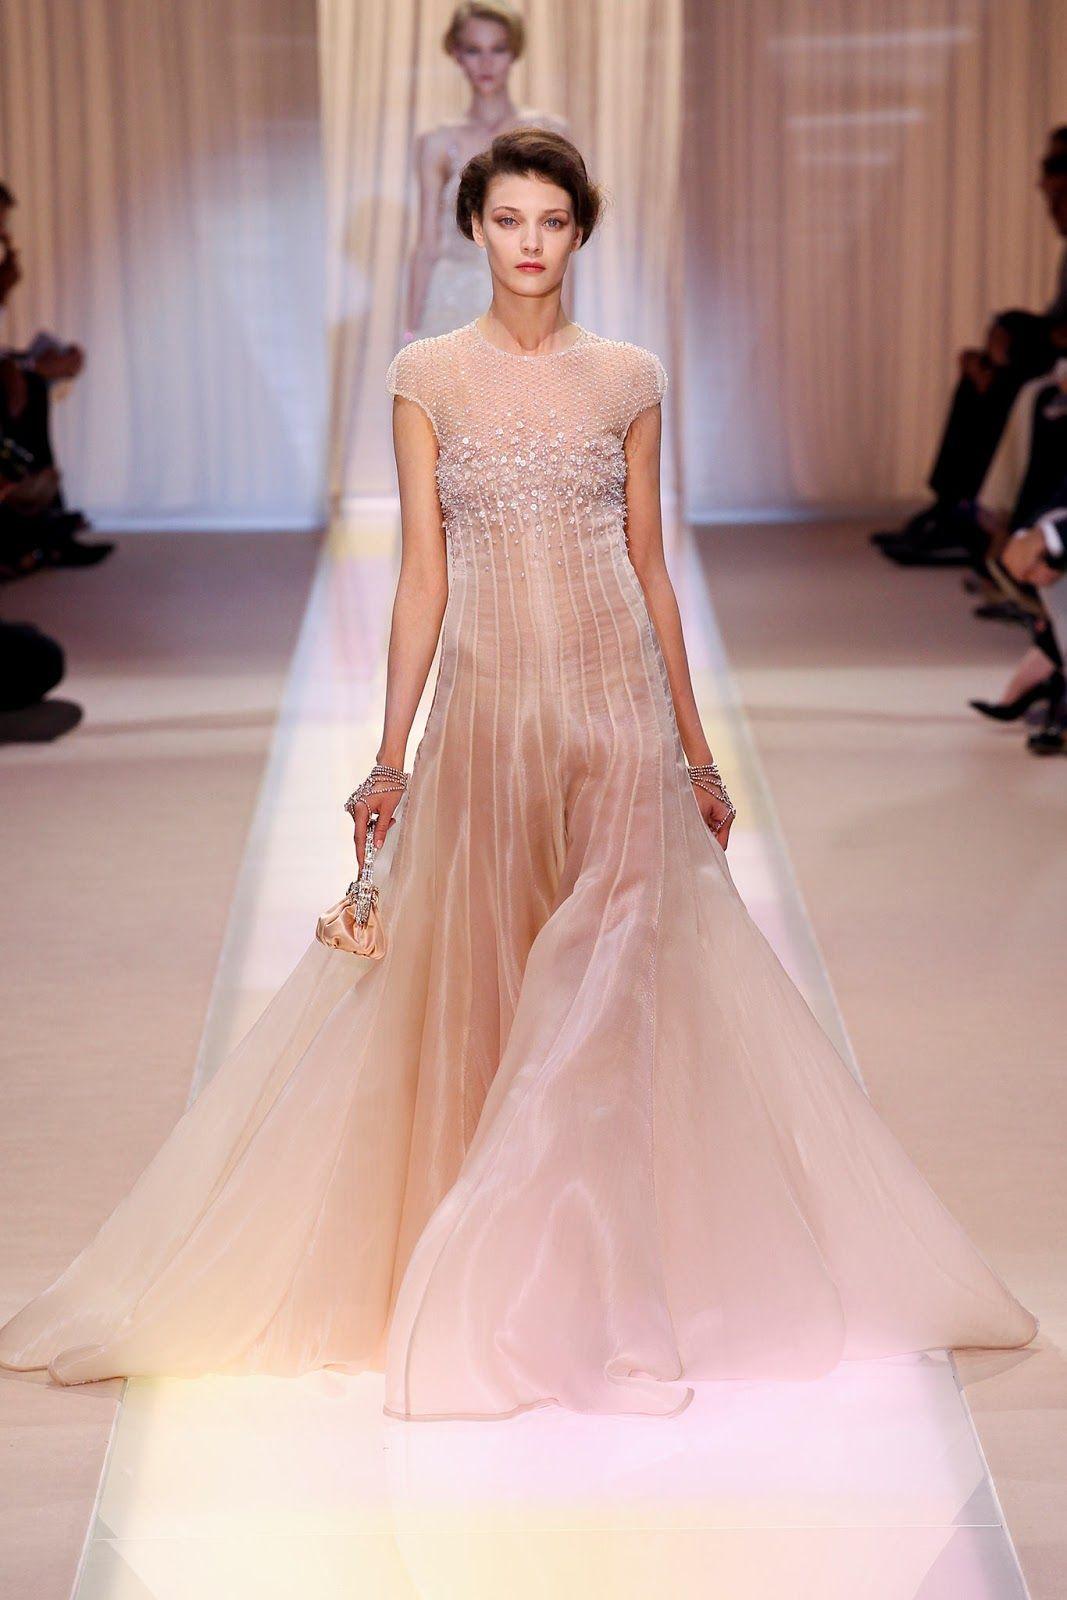 Christian Dior / Haute Couture Fall/Winter 2014 | Christian dior ...